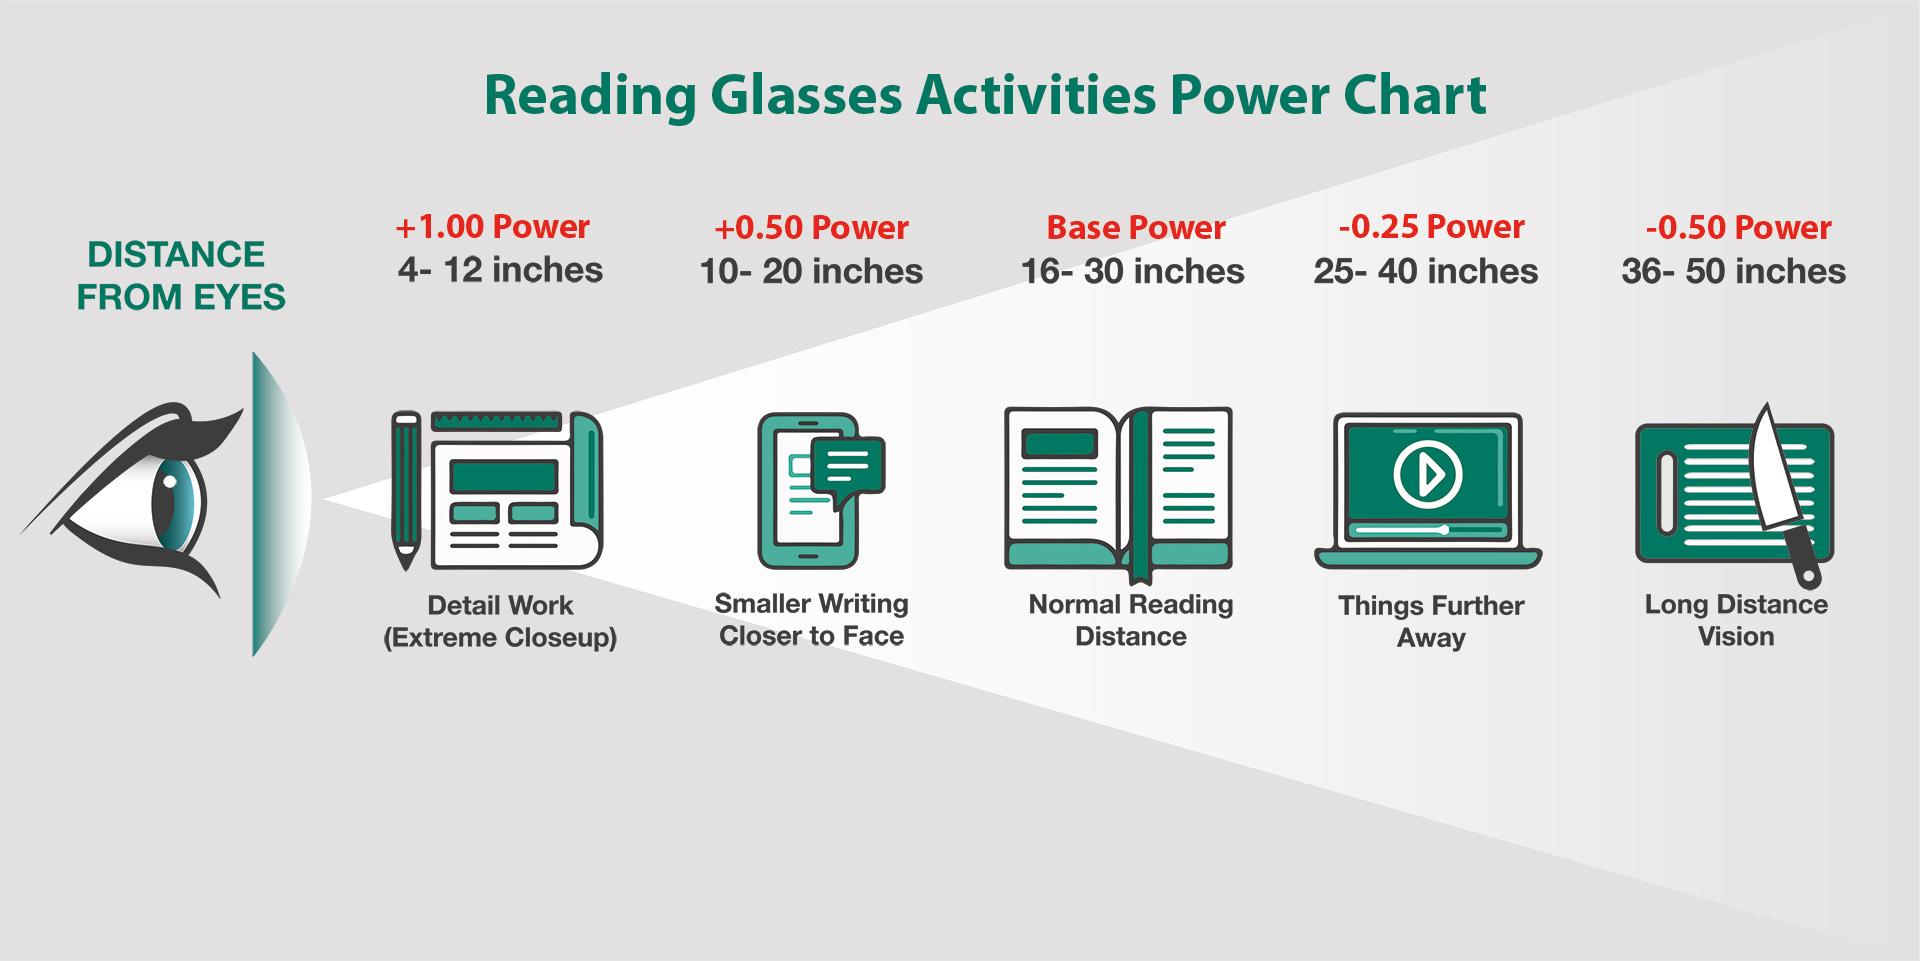 reading-glasses-activities-power-chart.jpg